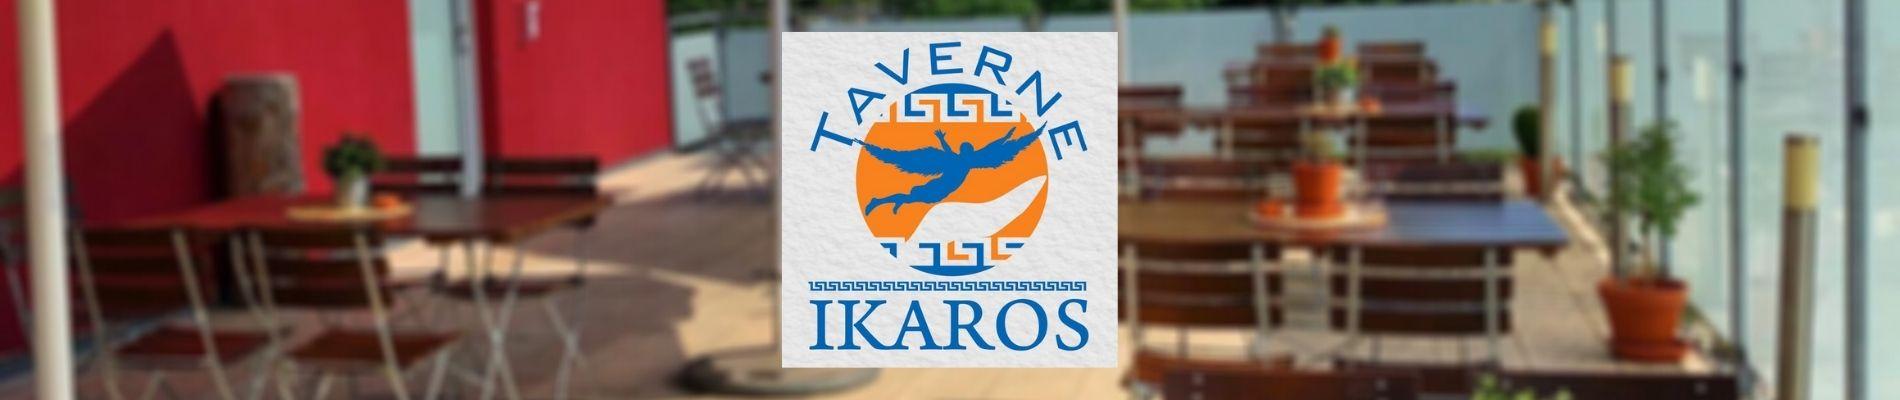 Restaurant Neumarkt Taverne Ikaros Teaser